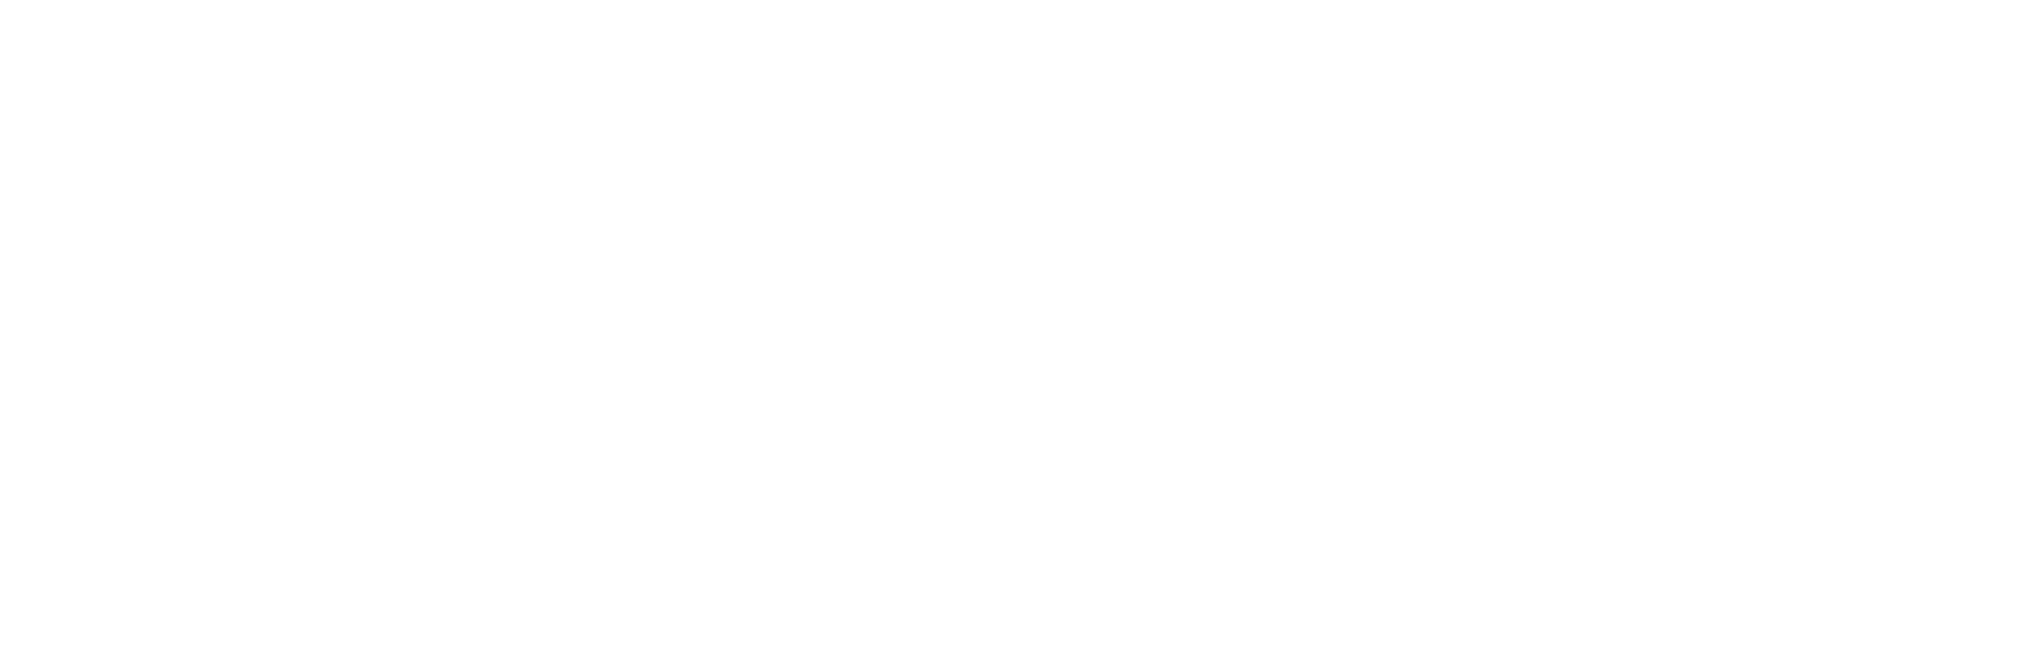 Schlesinger Lazetera & Auchincloss LLP Logo Autocropped White Transparent.png